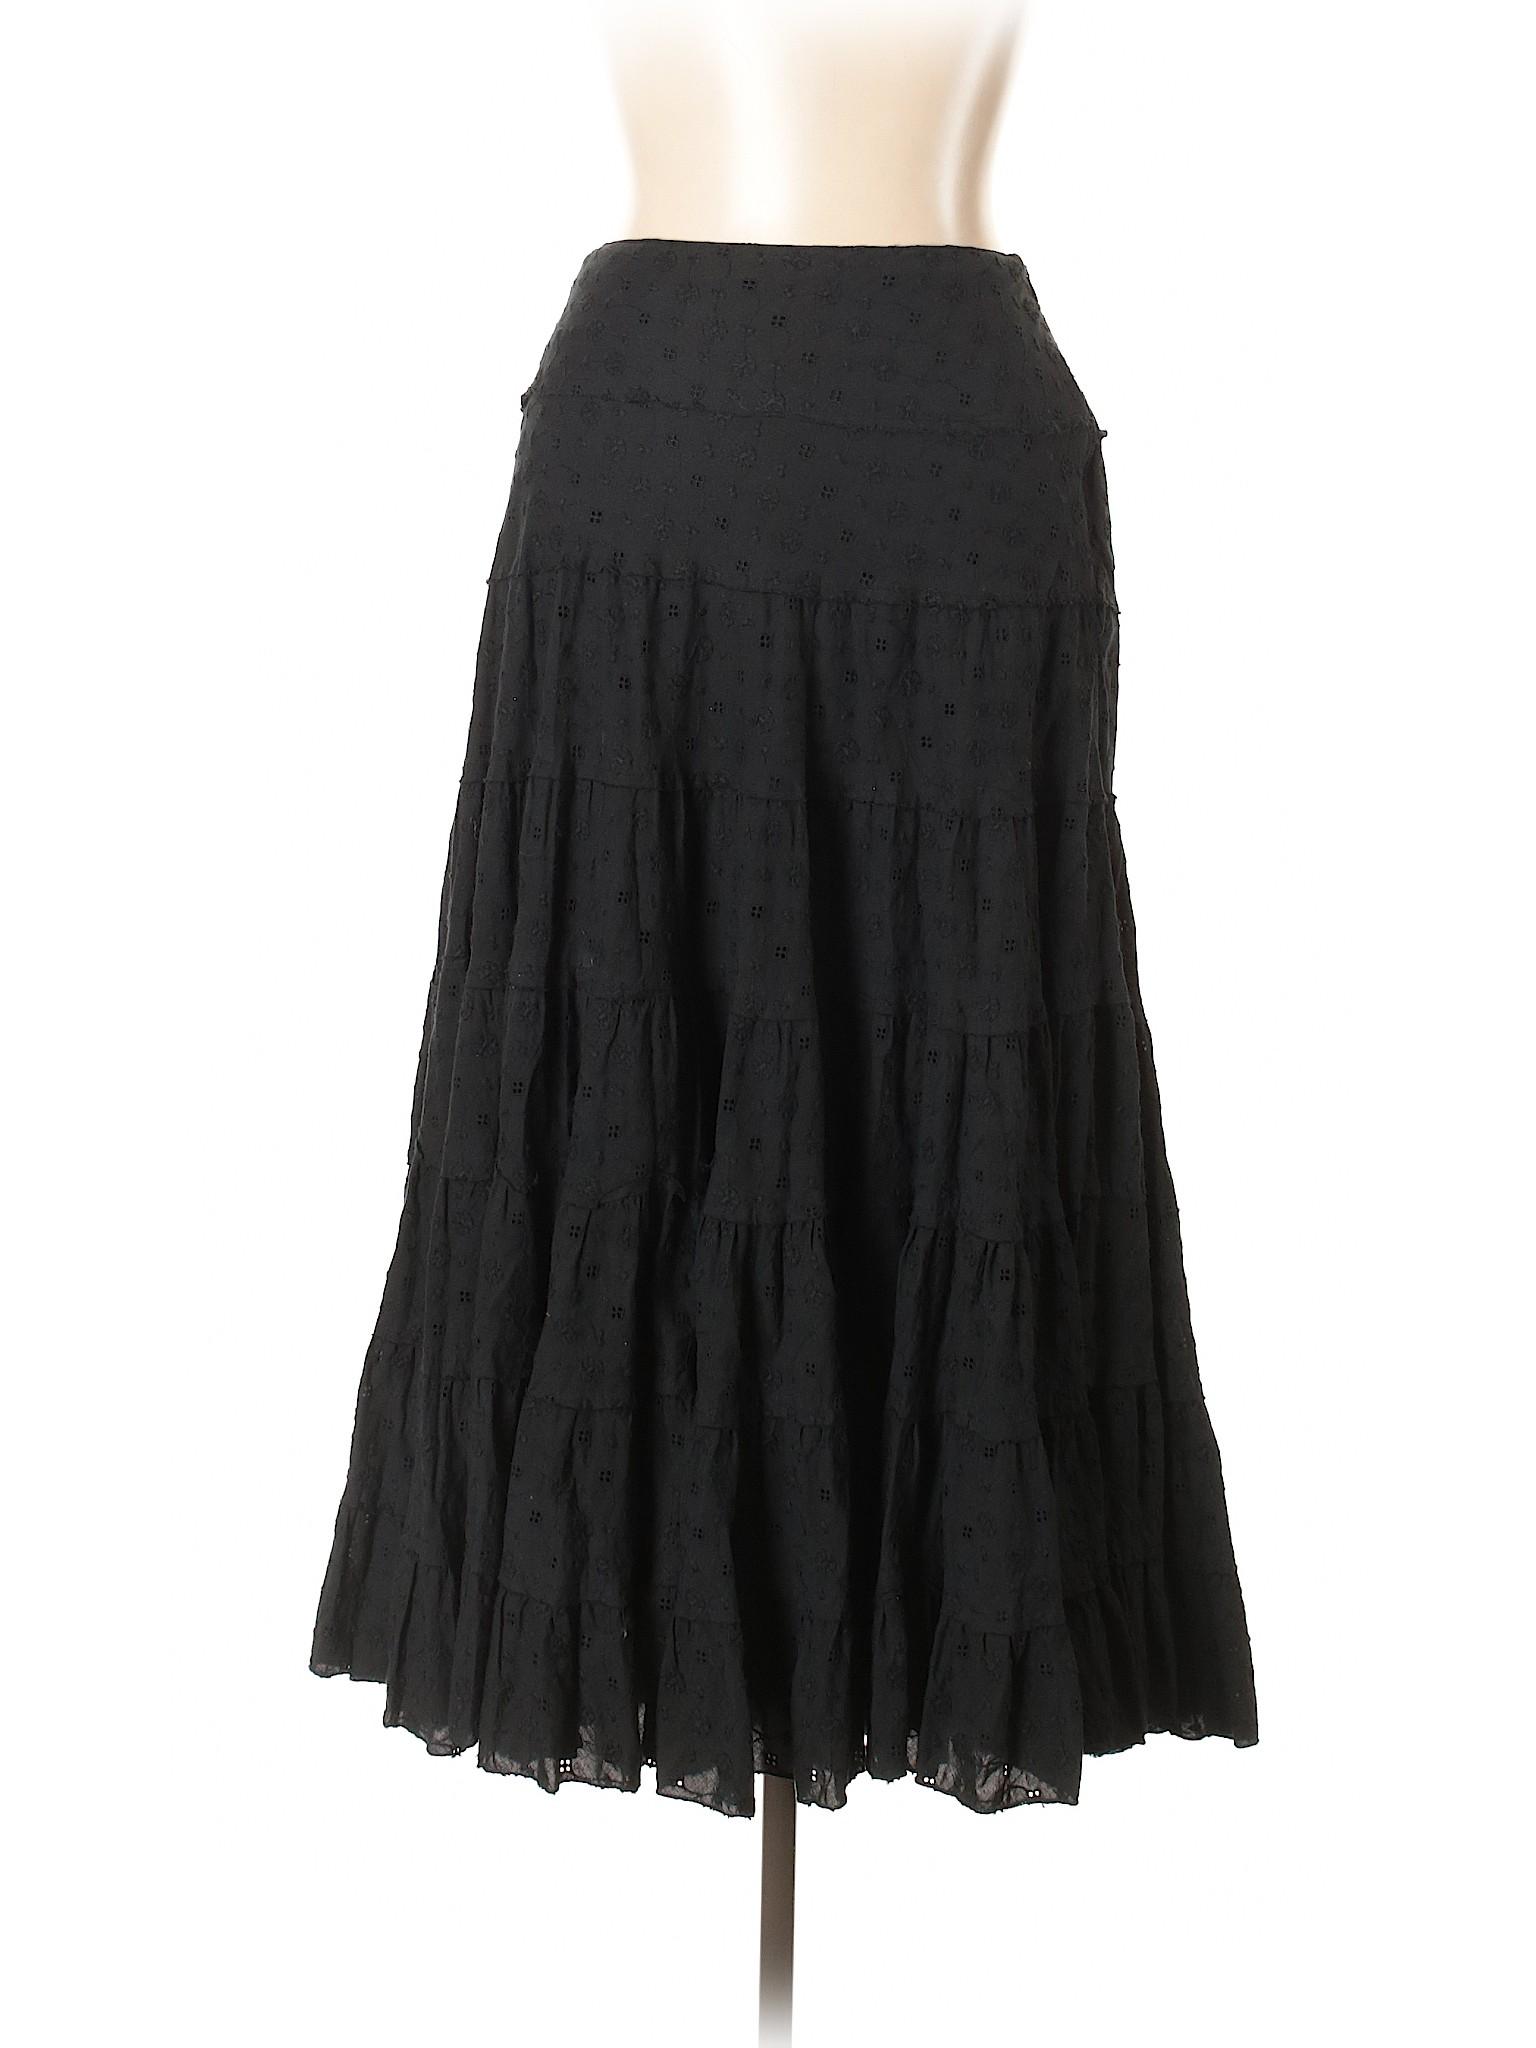 Skirt Skirt Skirt Boutique Casual Boutique Casual Casual Boutique qAA8awH